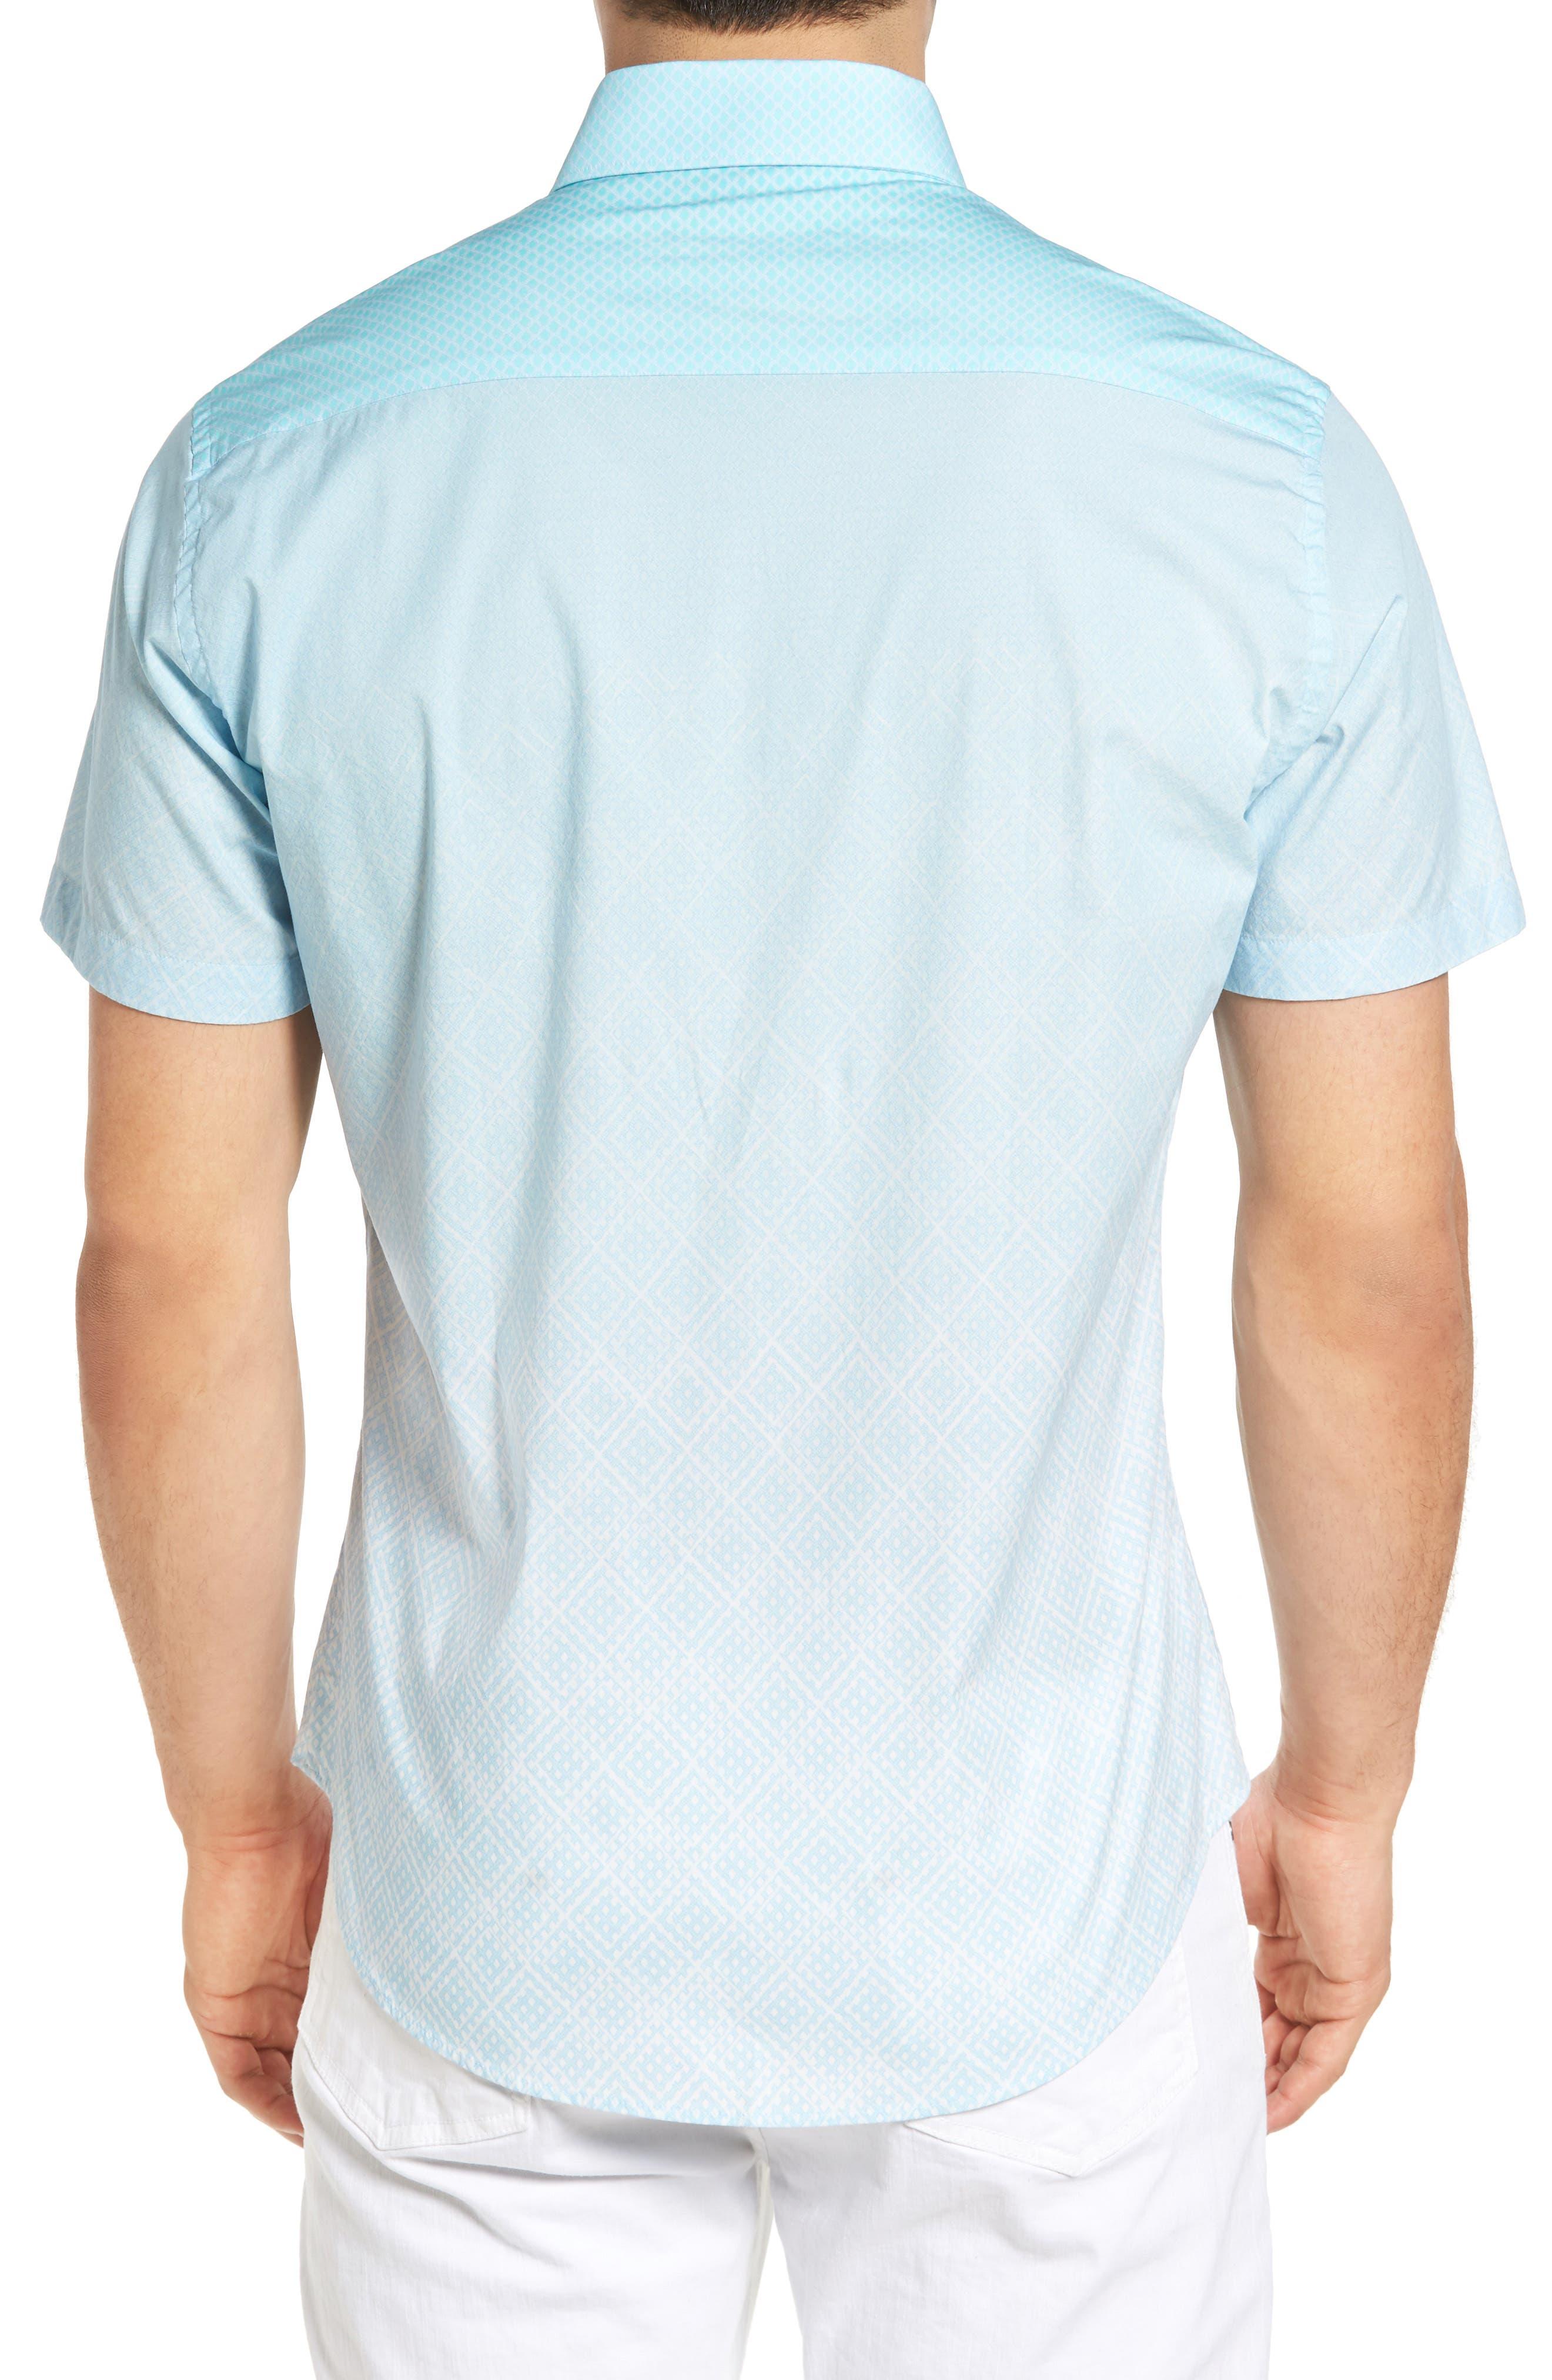 Gradient Diamond Sport Shirt,                             Alternate thumbnail 2, color,                             330